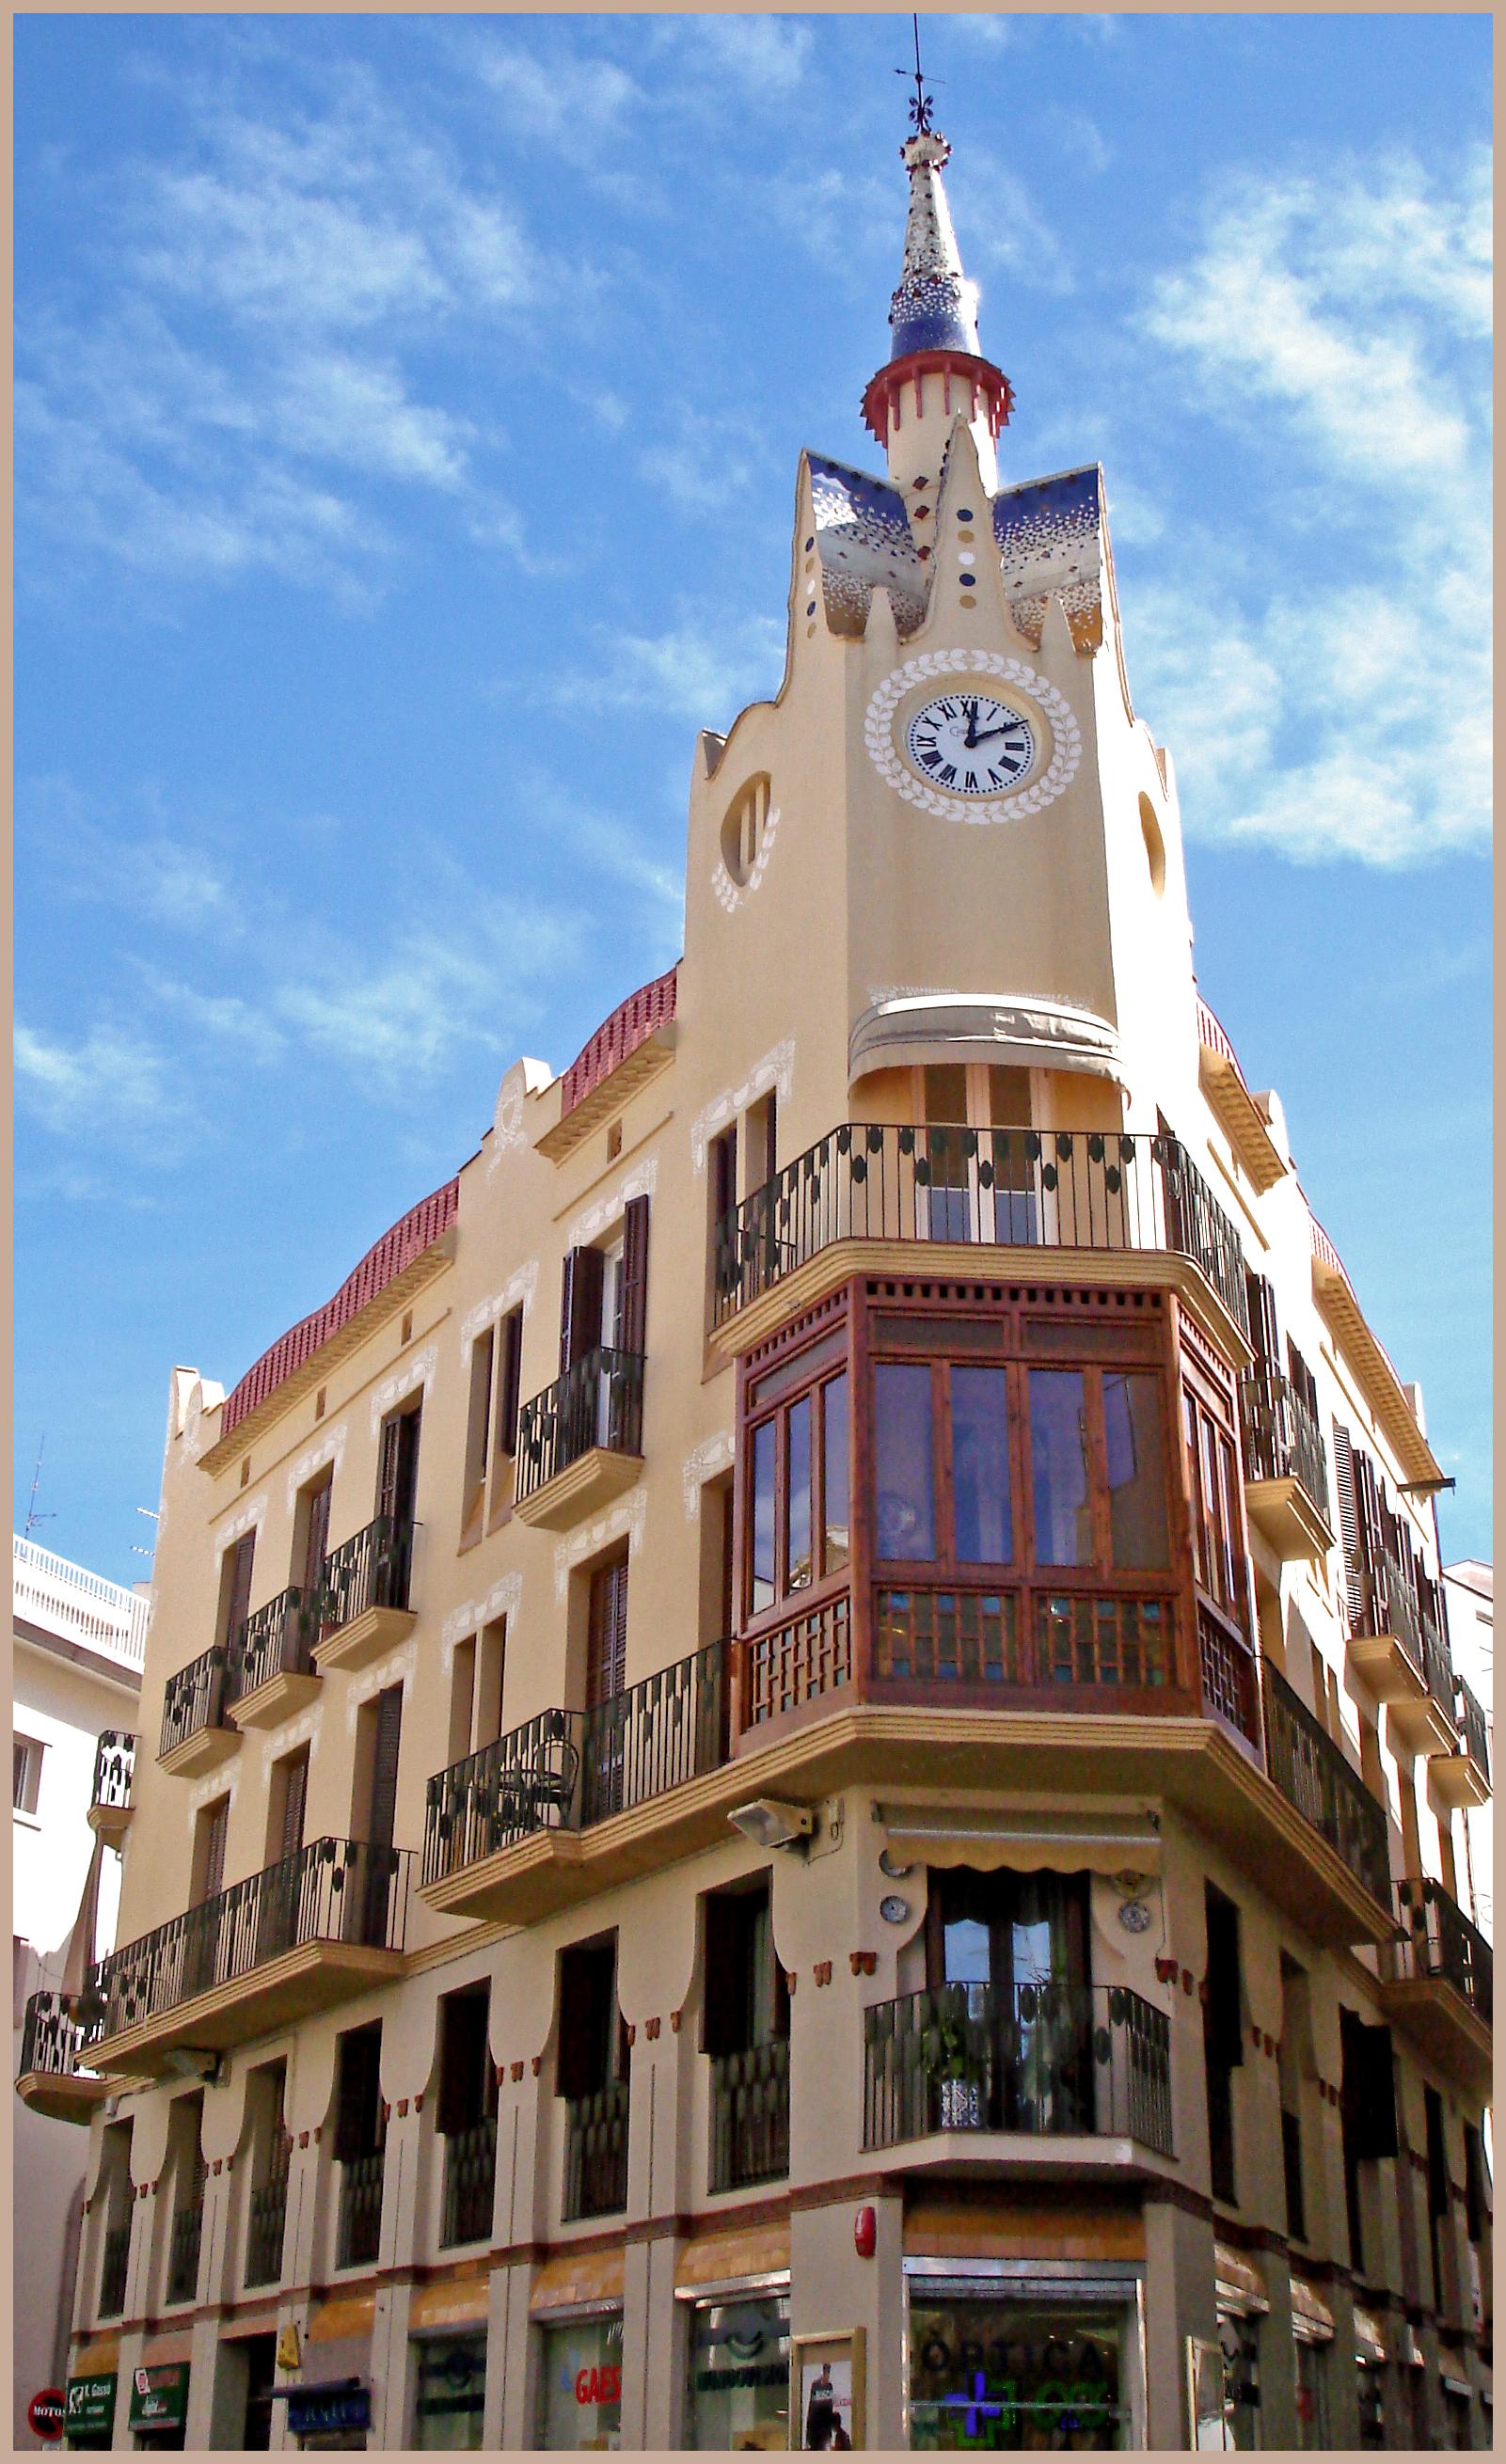 Hotel Nord Otaru Filesitges Casa Bartomeu Carbonell 2jpg Wikimedia Commons